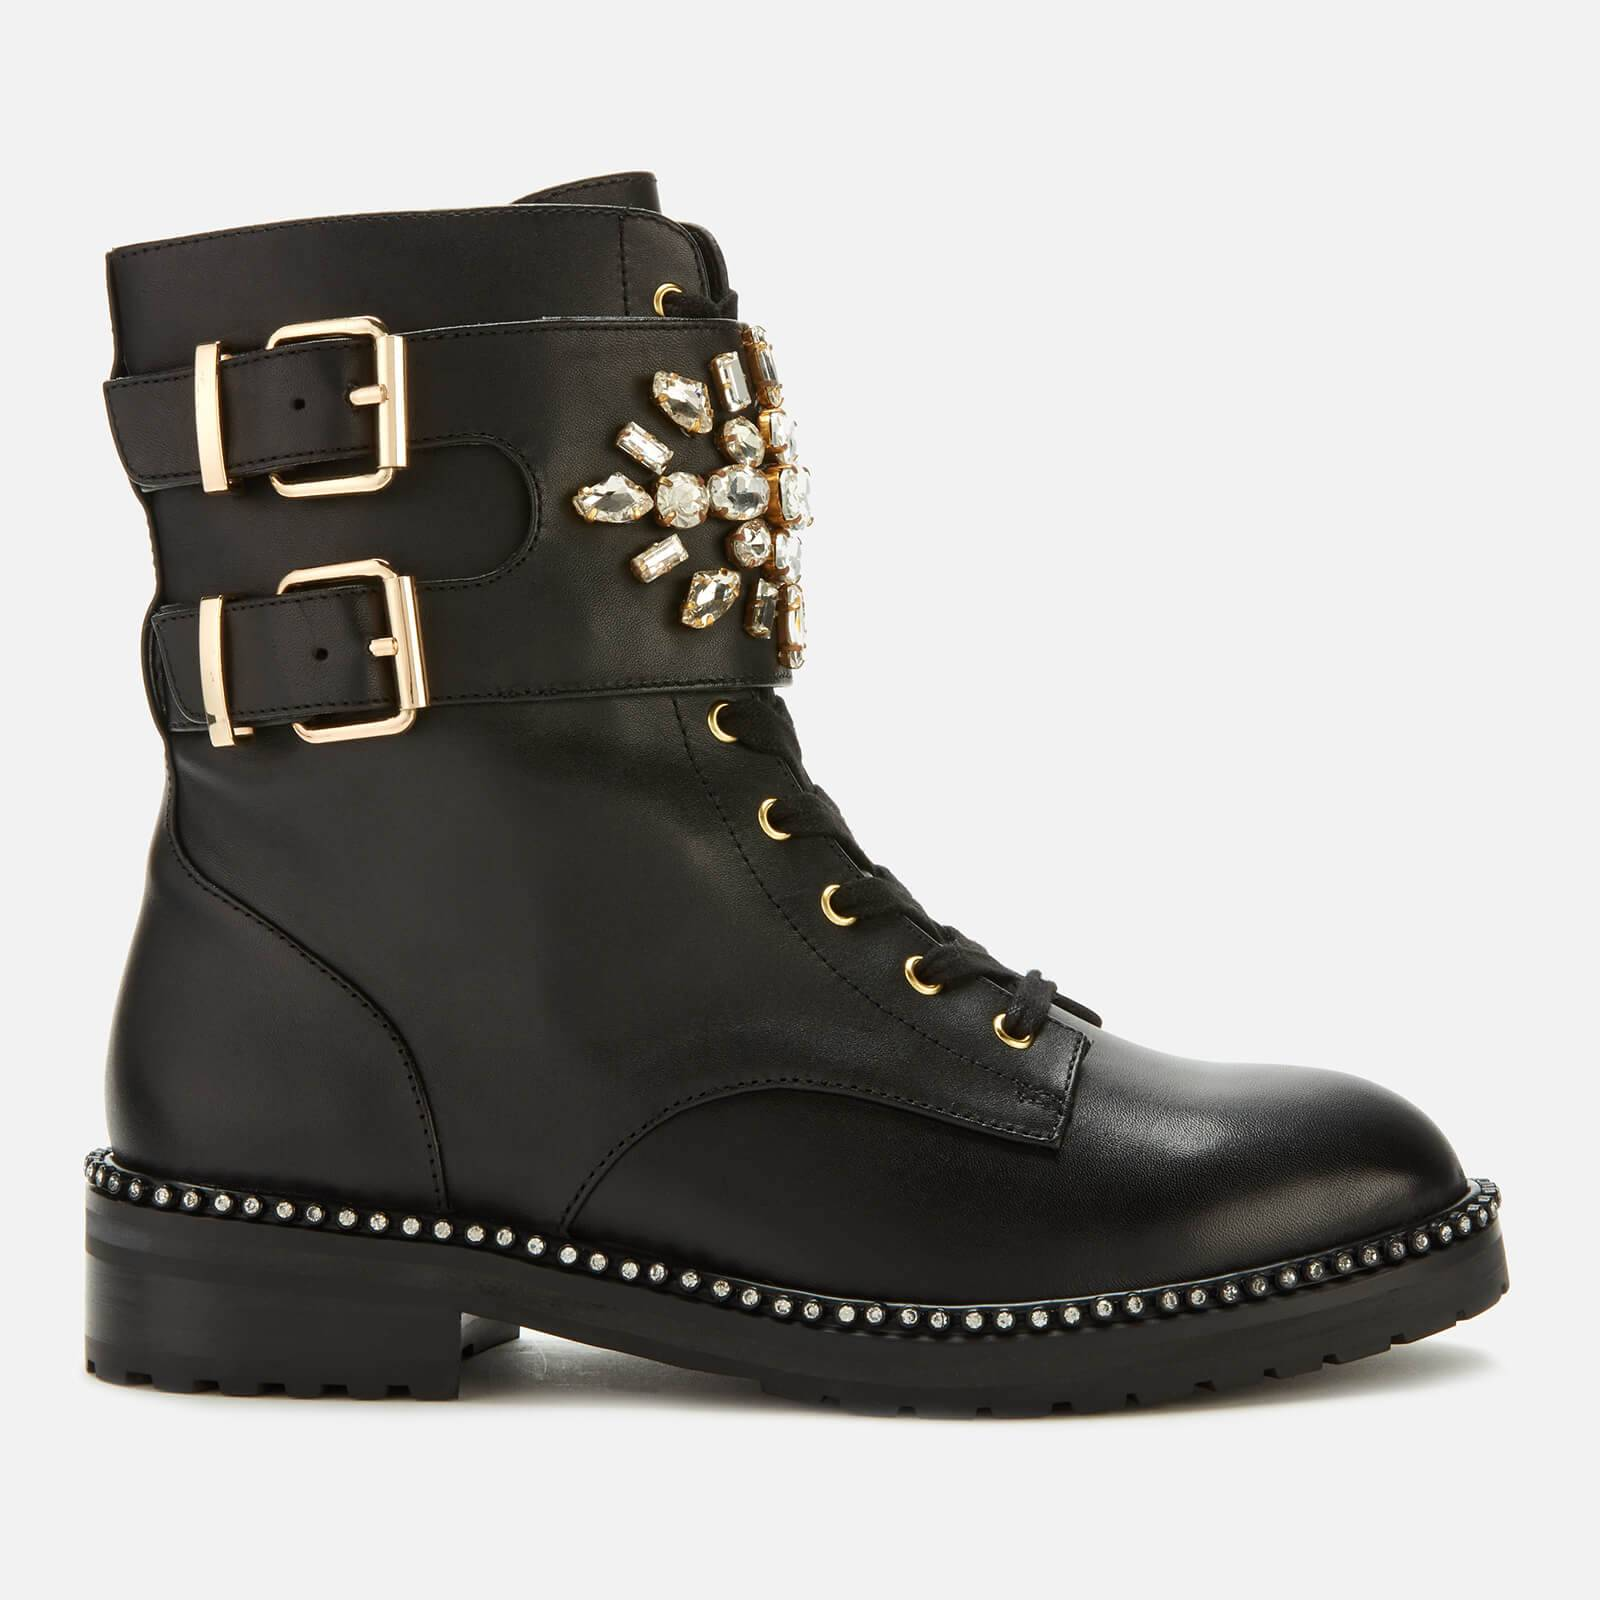 Kurt Geiger London Women's Stoop Leather Lace Up Boots - Black - UK 3